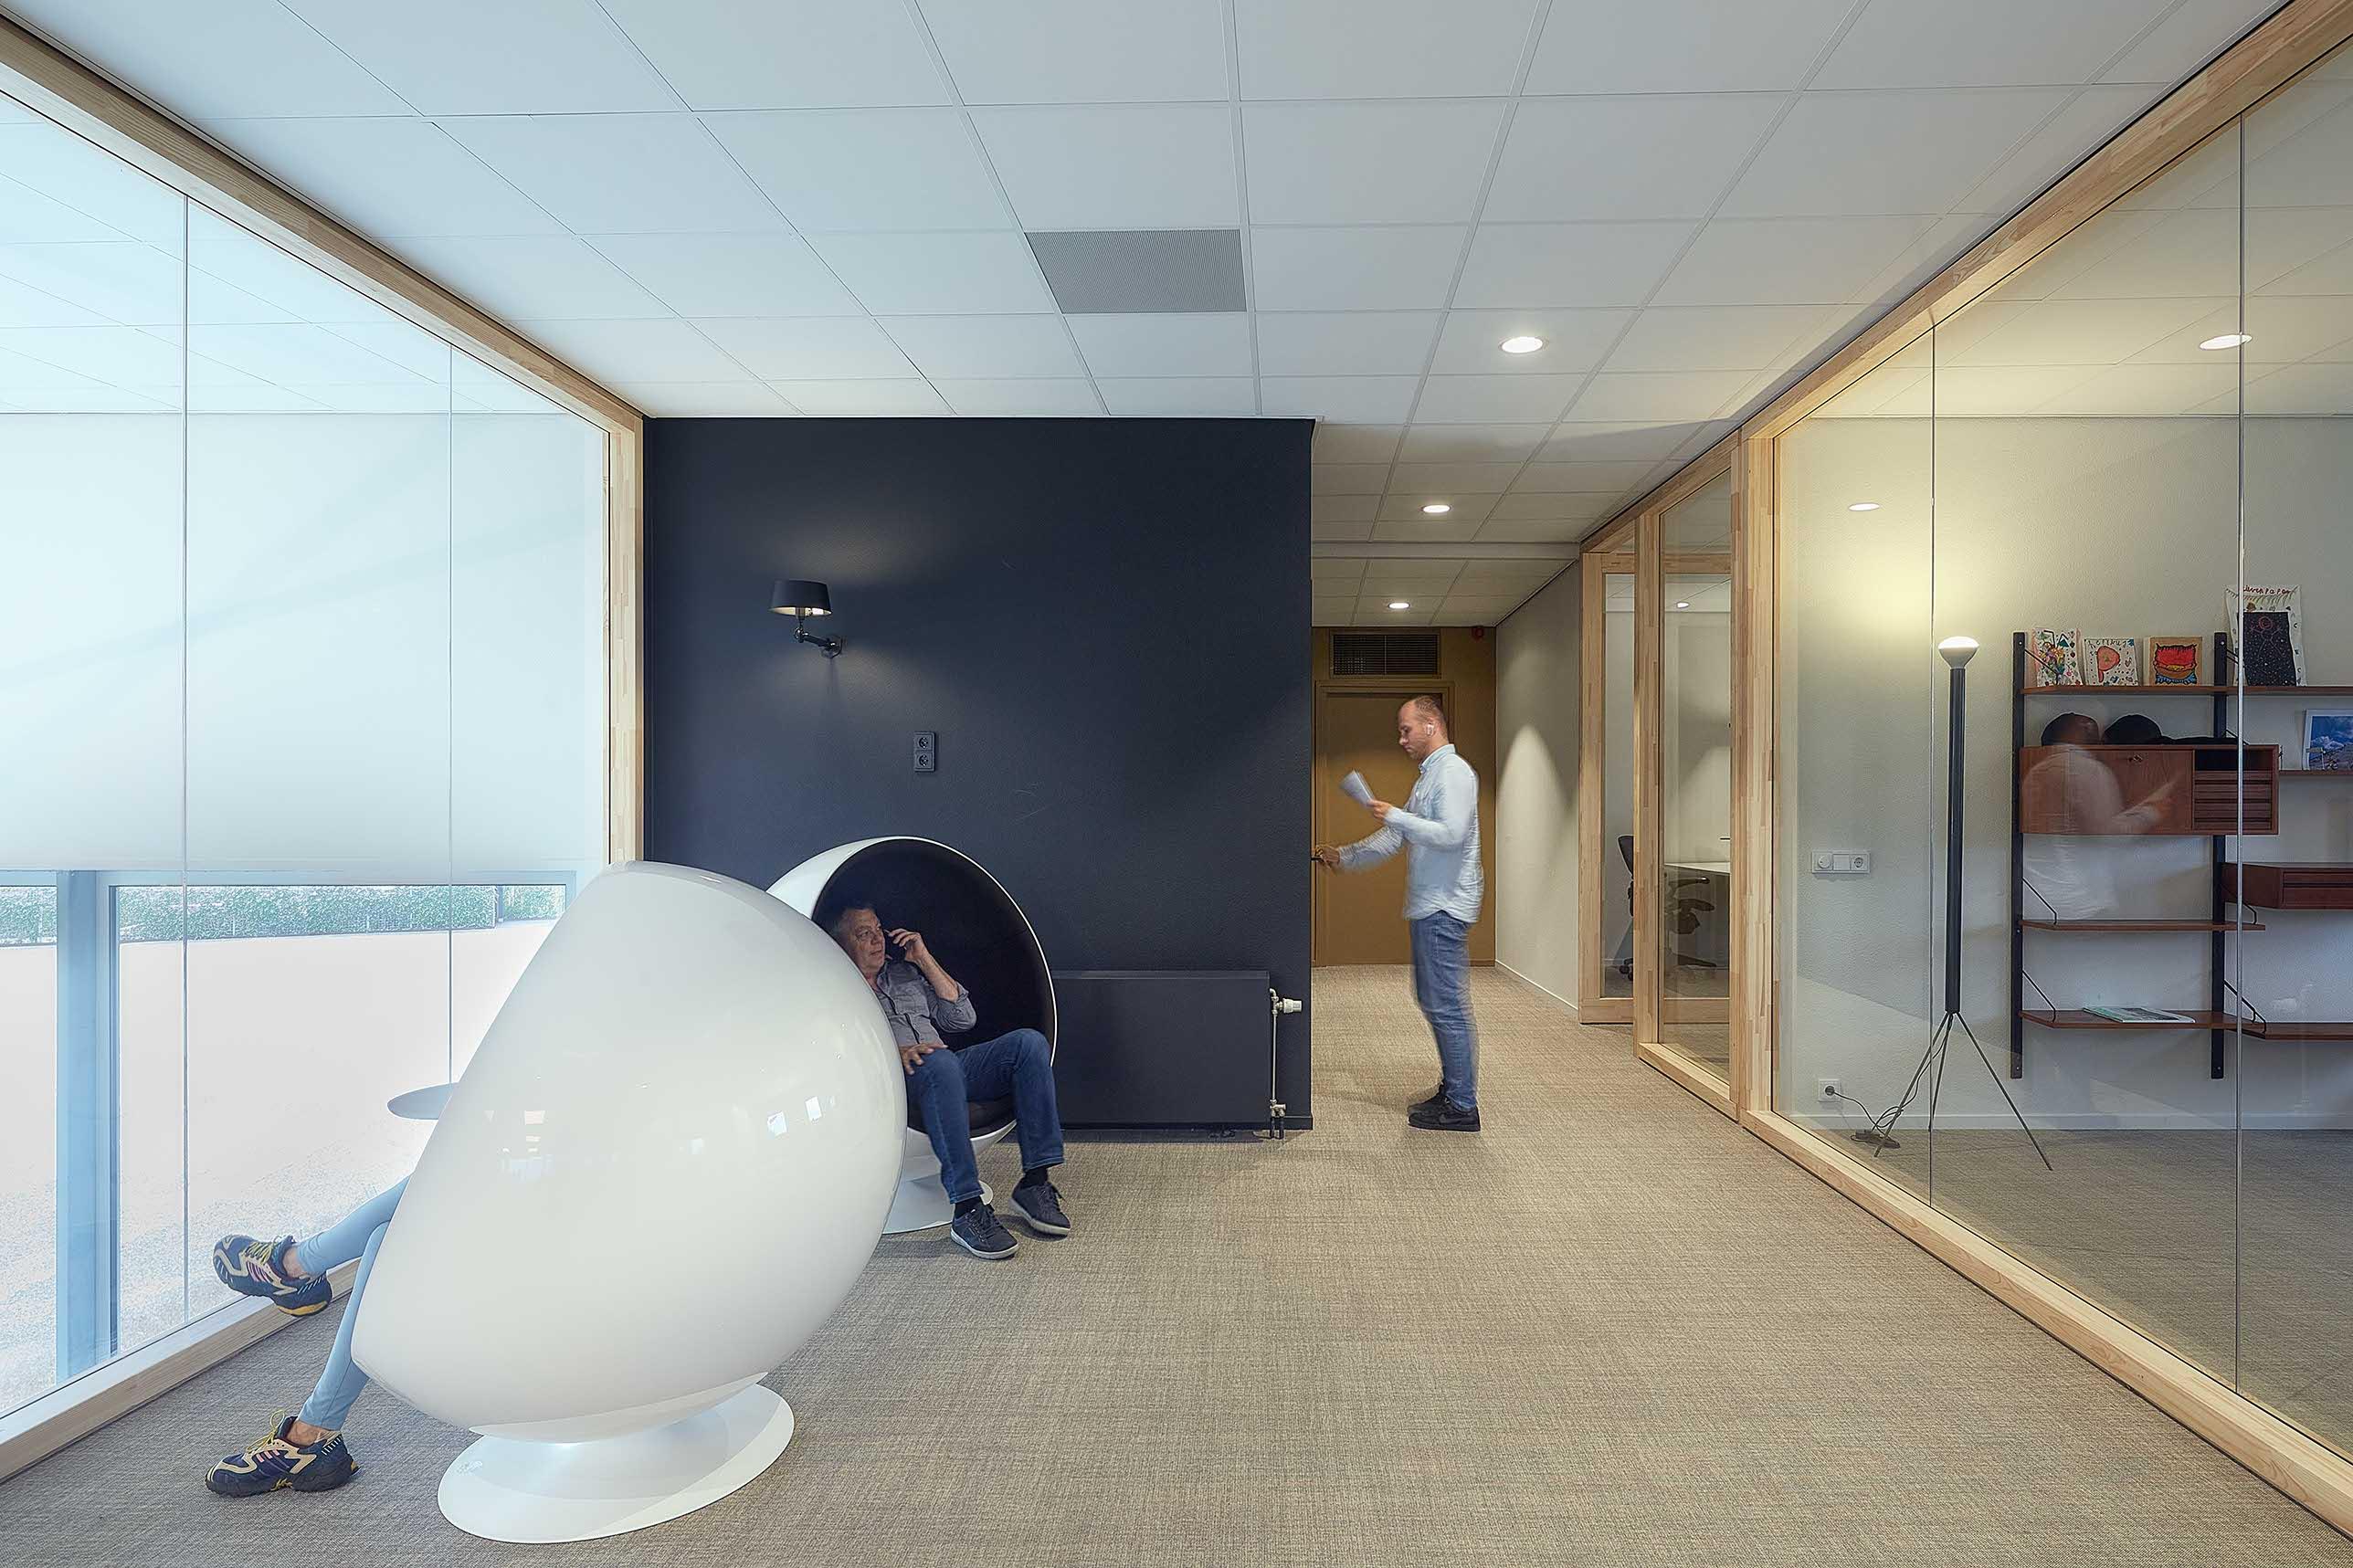 369.-Office-FritsJurgens---doors-by-Harryvan-Interieurbouw---photography-by-Gerard-van-der-Beek22.jpeg